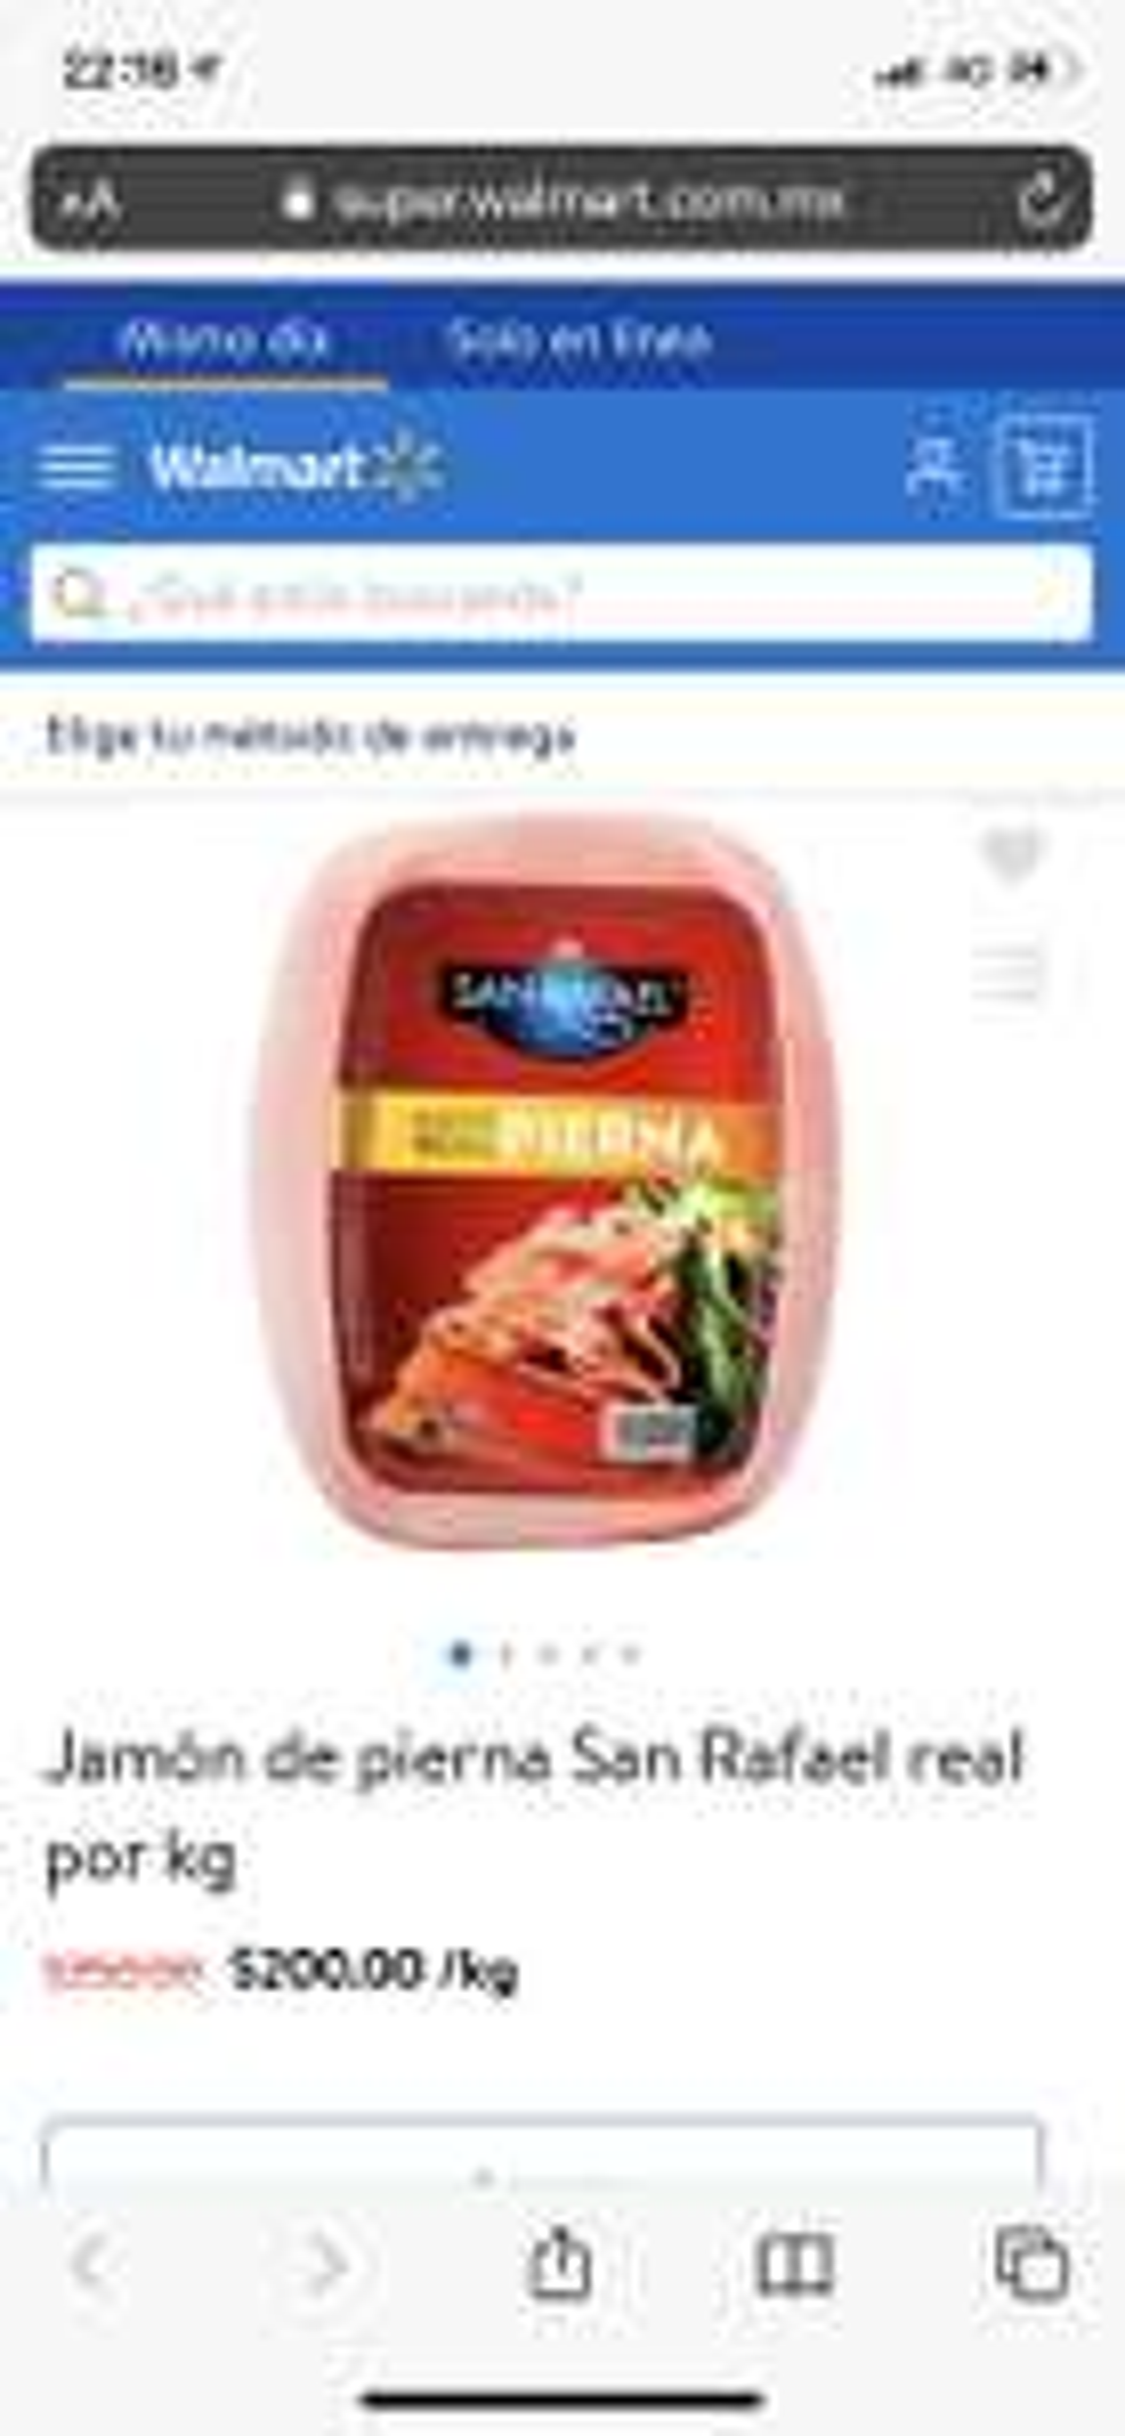 Walmart: kg de Jamón de pierna San Rafael